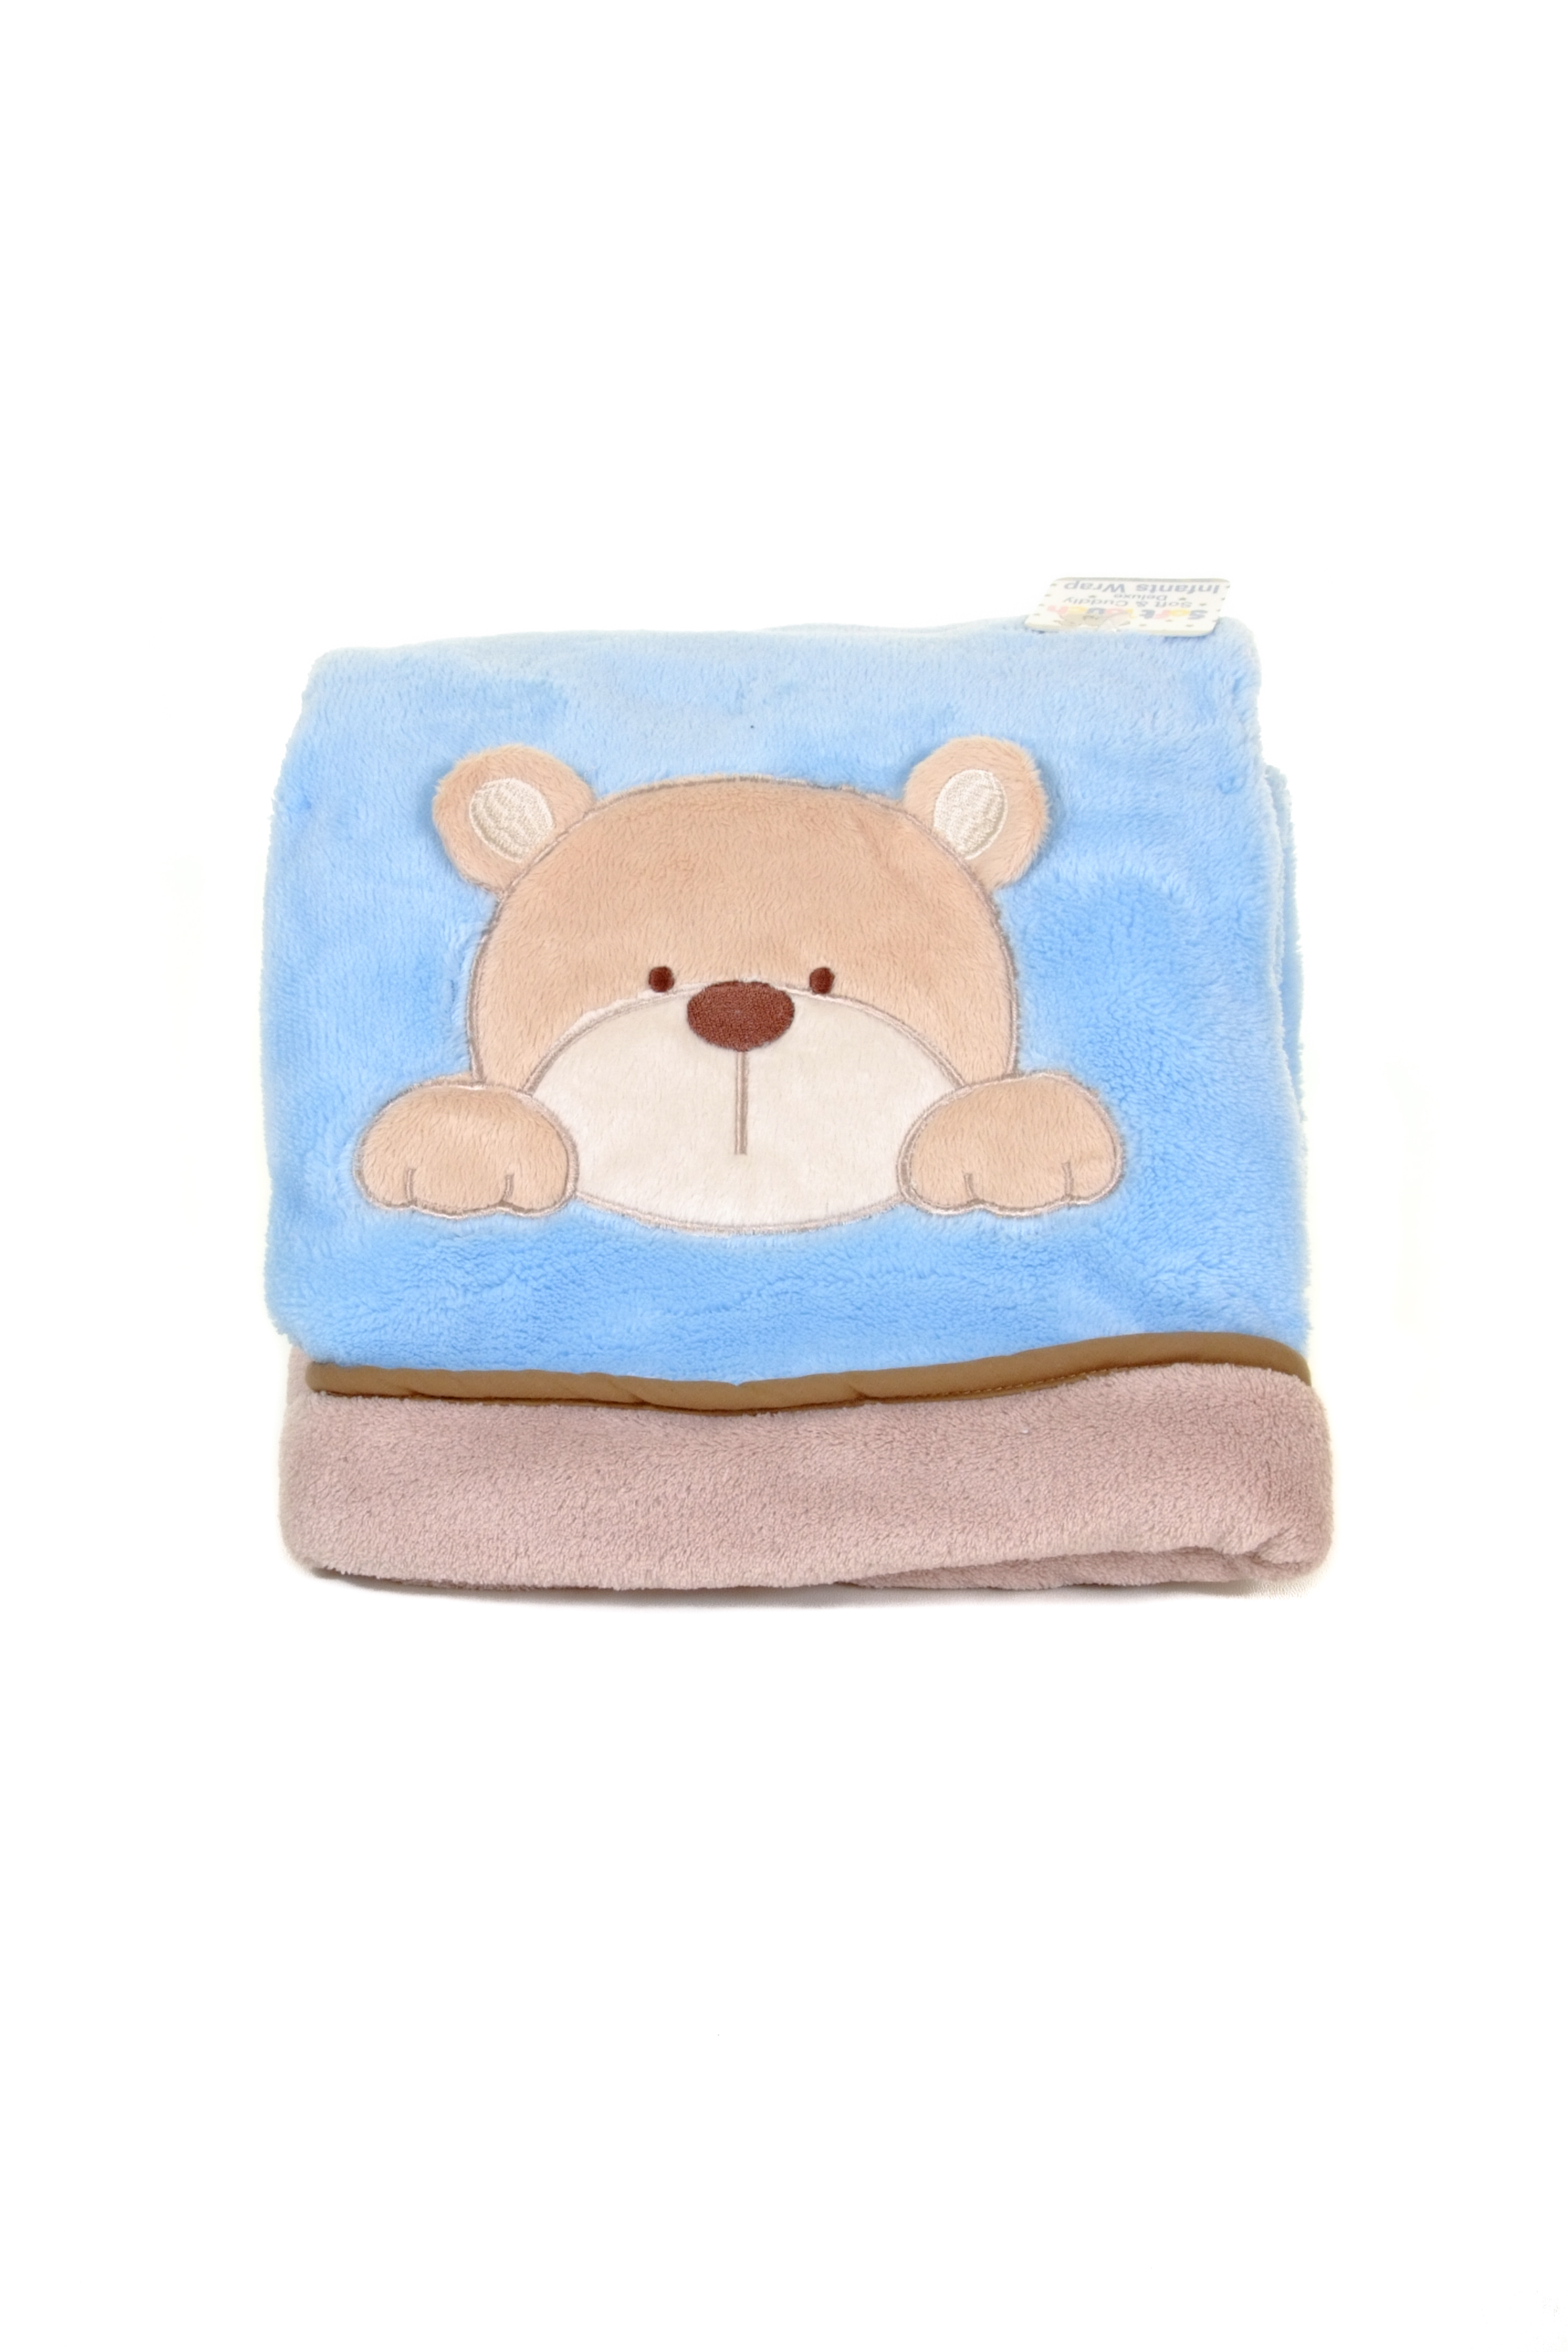 Baby Boy Gift Box : Baby boy gift box l